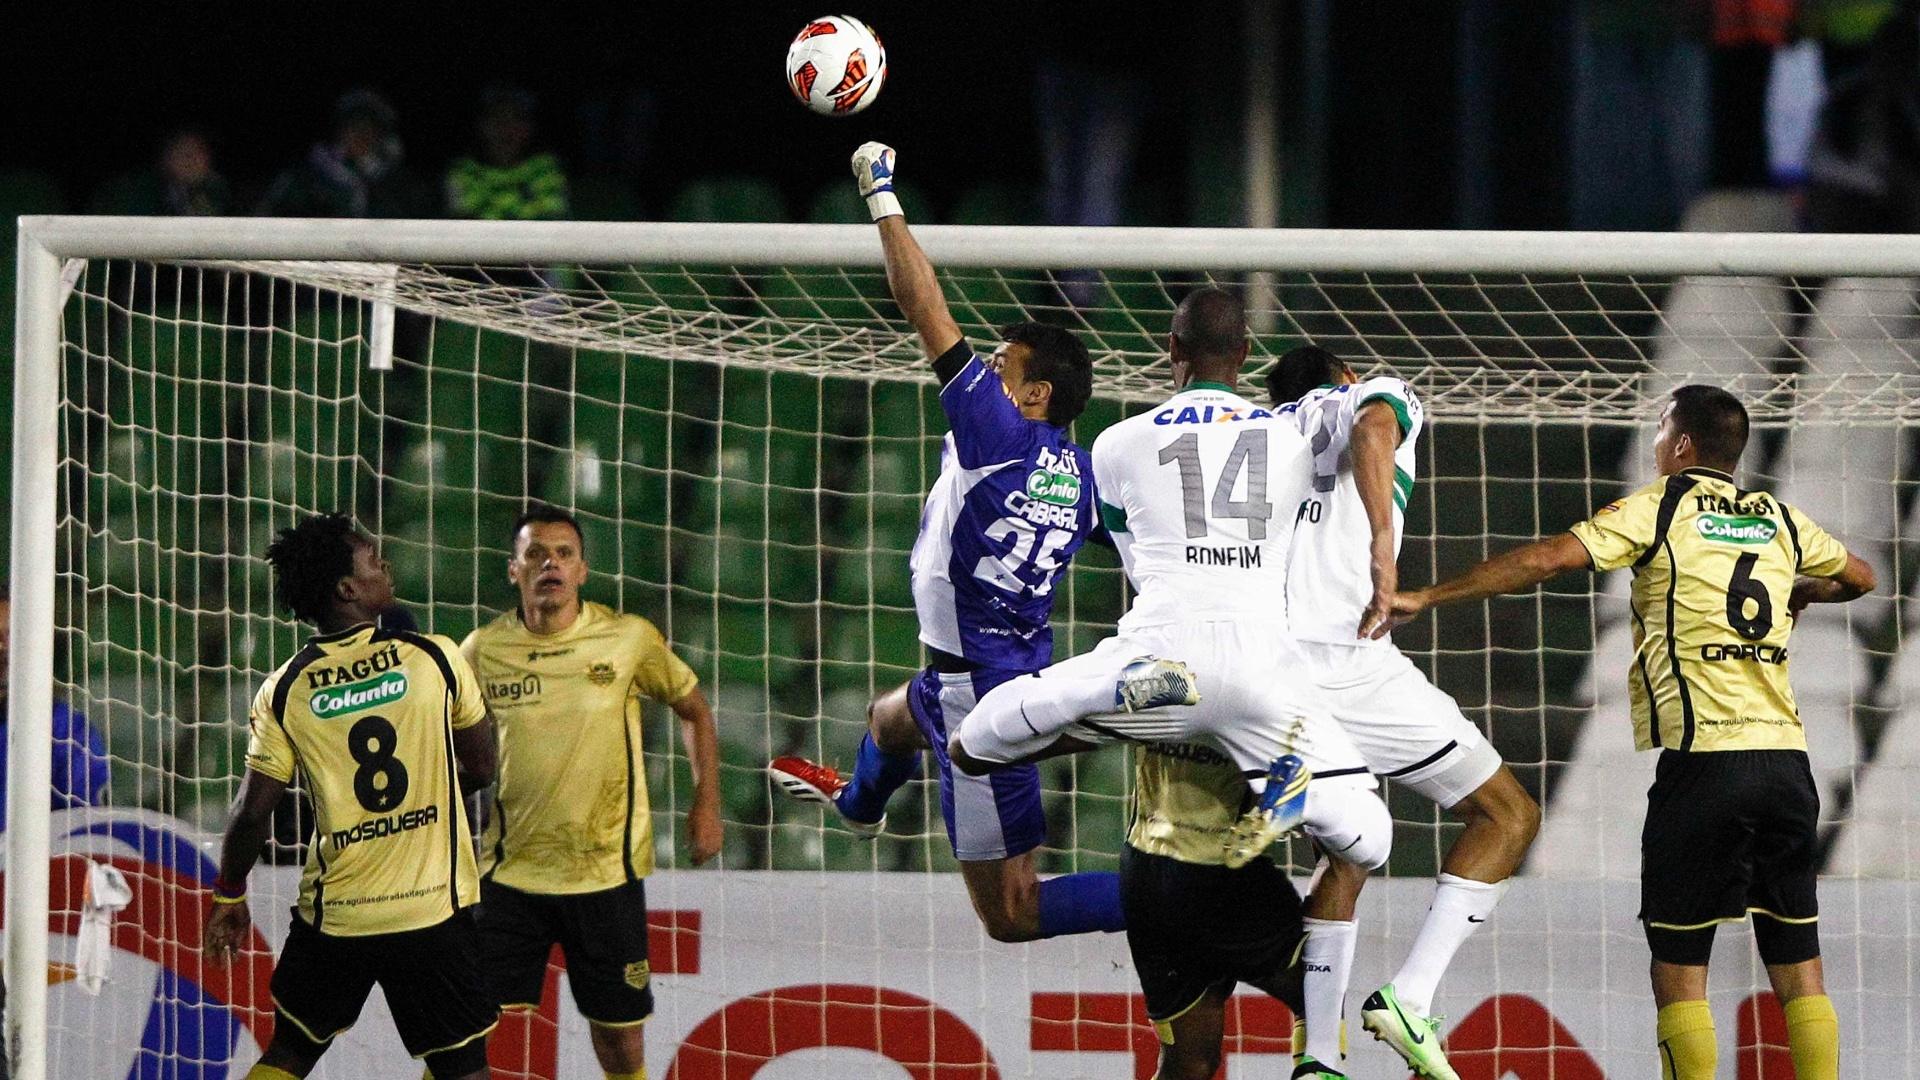 24.set.2013 - Goleiro Cabral afasta a bola durante duelo entre Coritiba x Itagui, pela Copa Sul-Americana